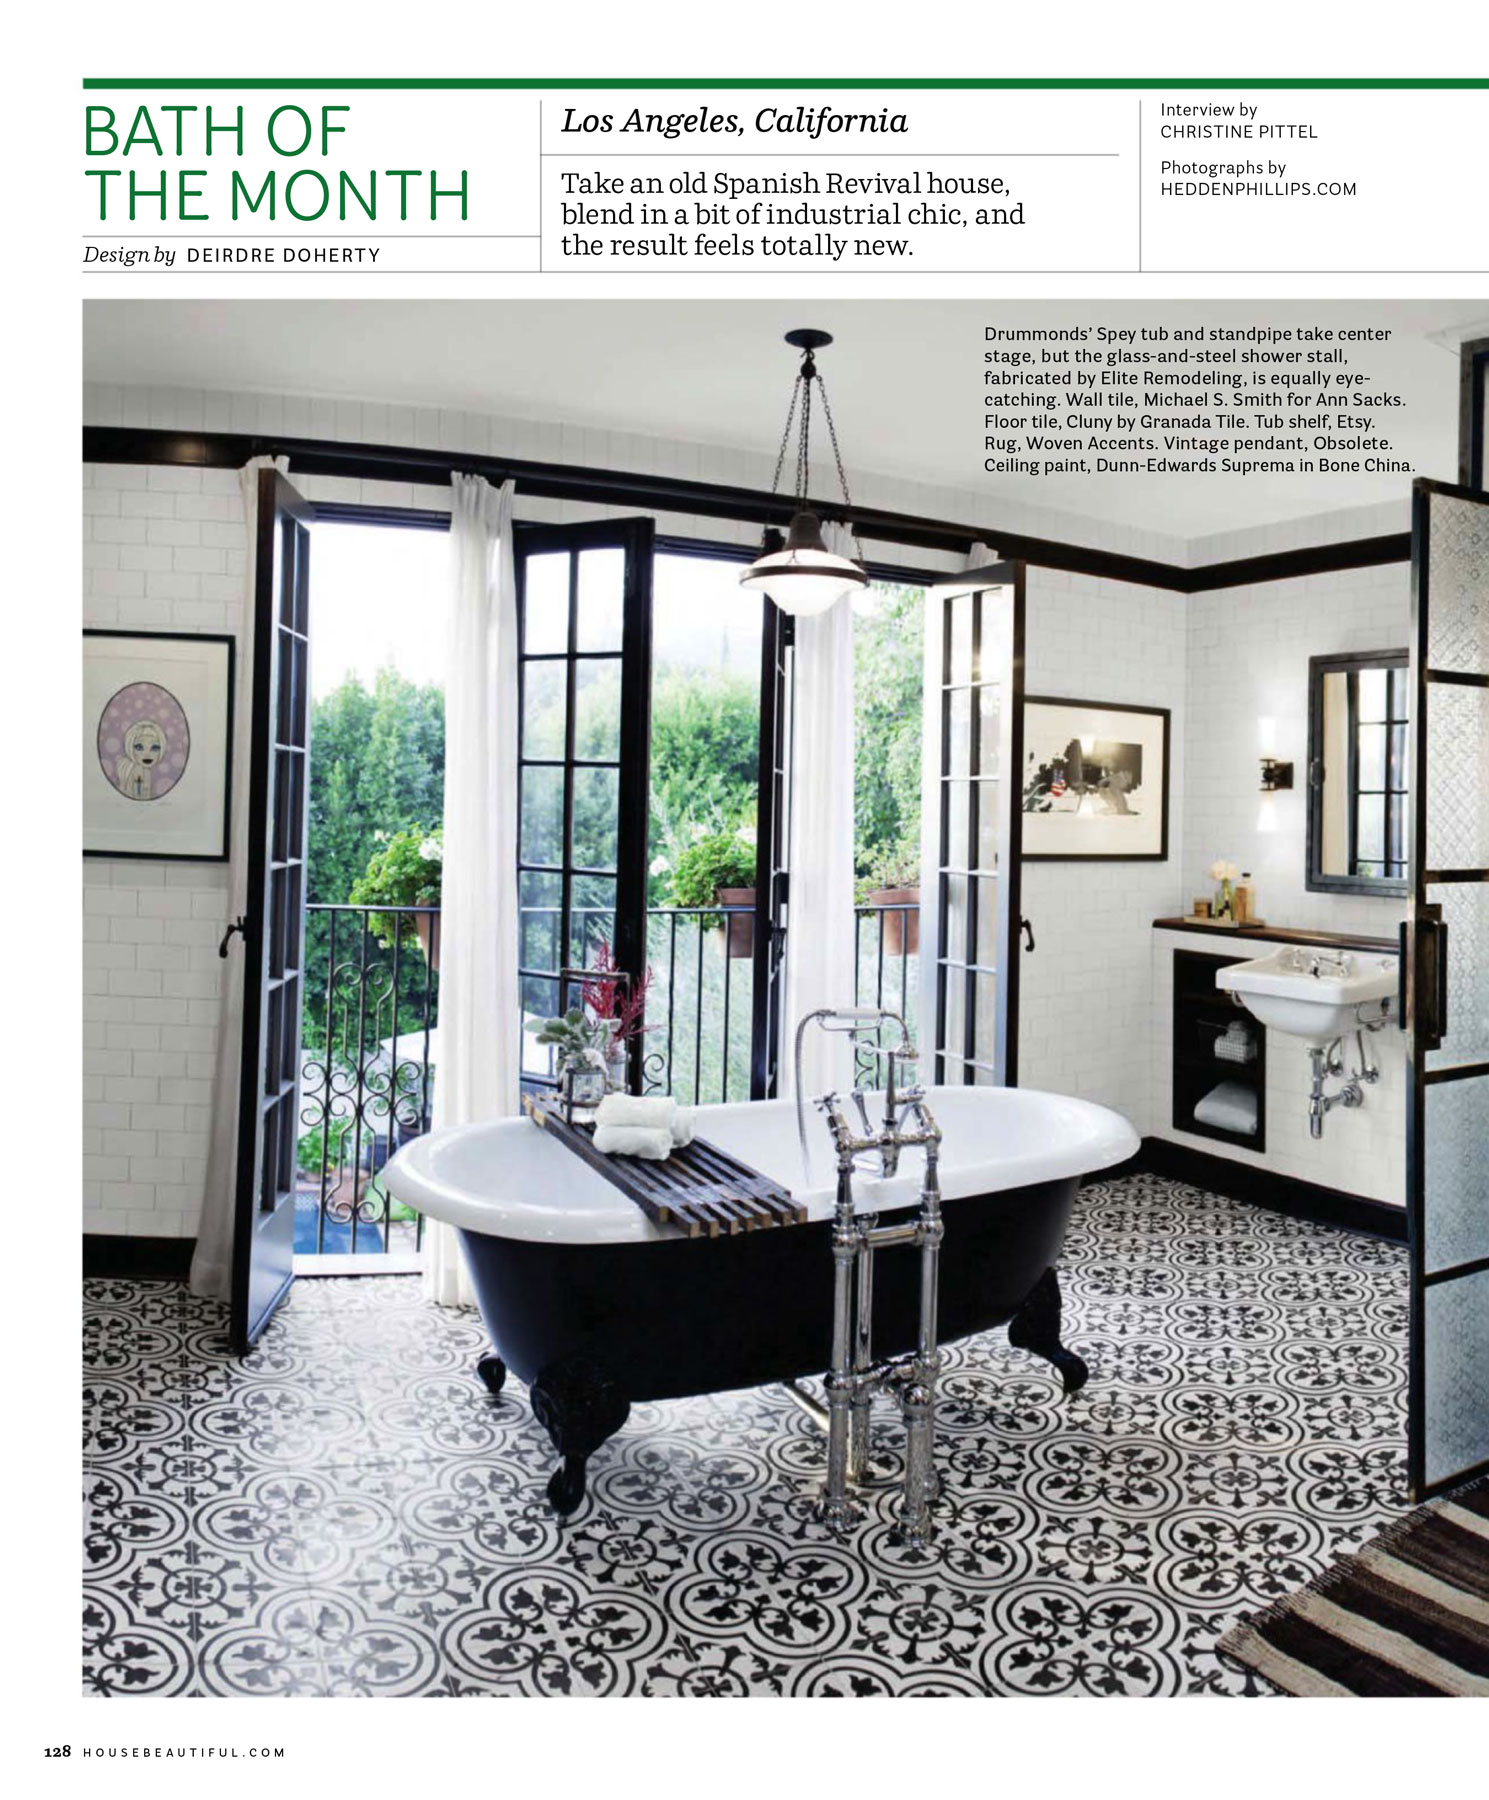 Christine Pittel house beautiful – deirdre doherty interiors | interior design